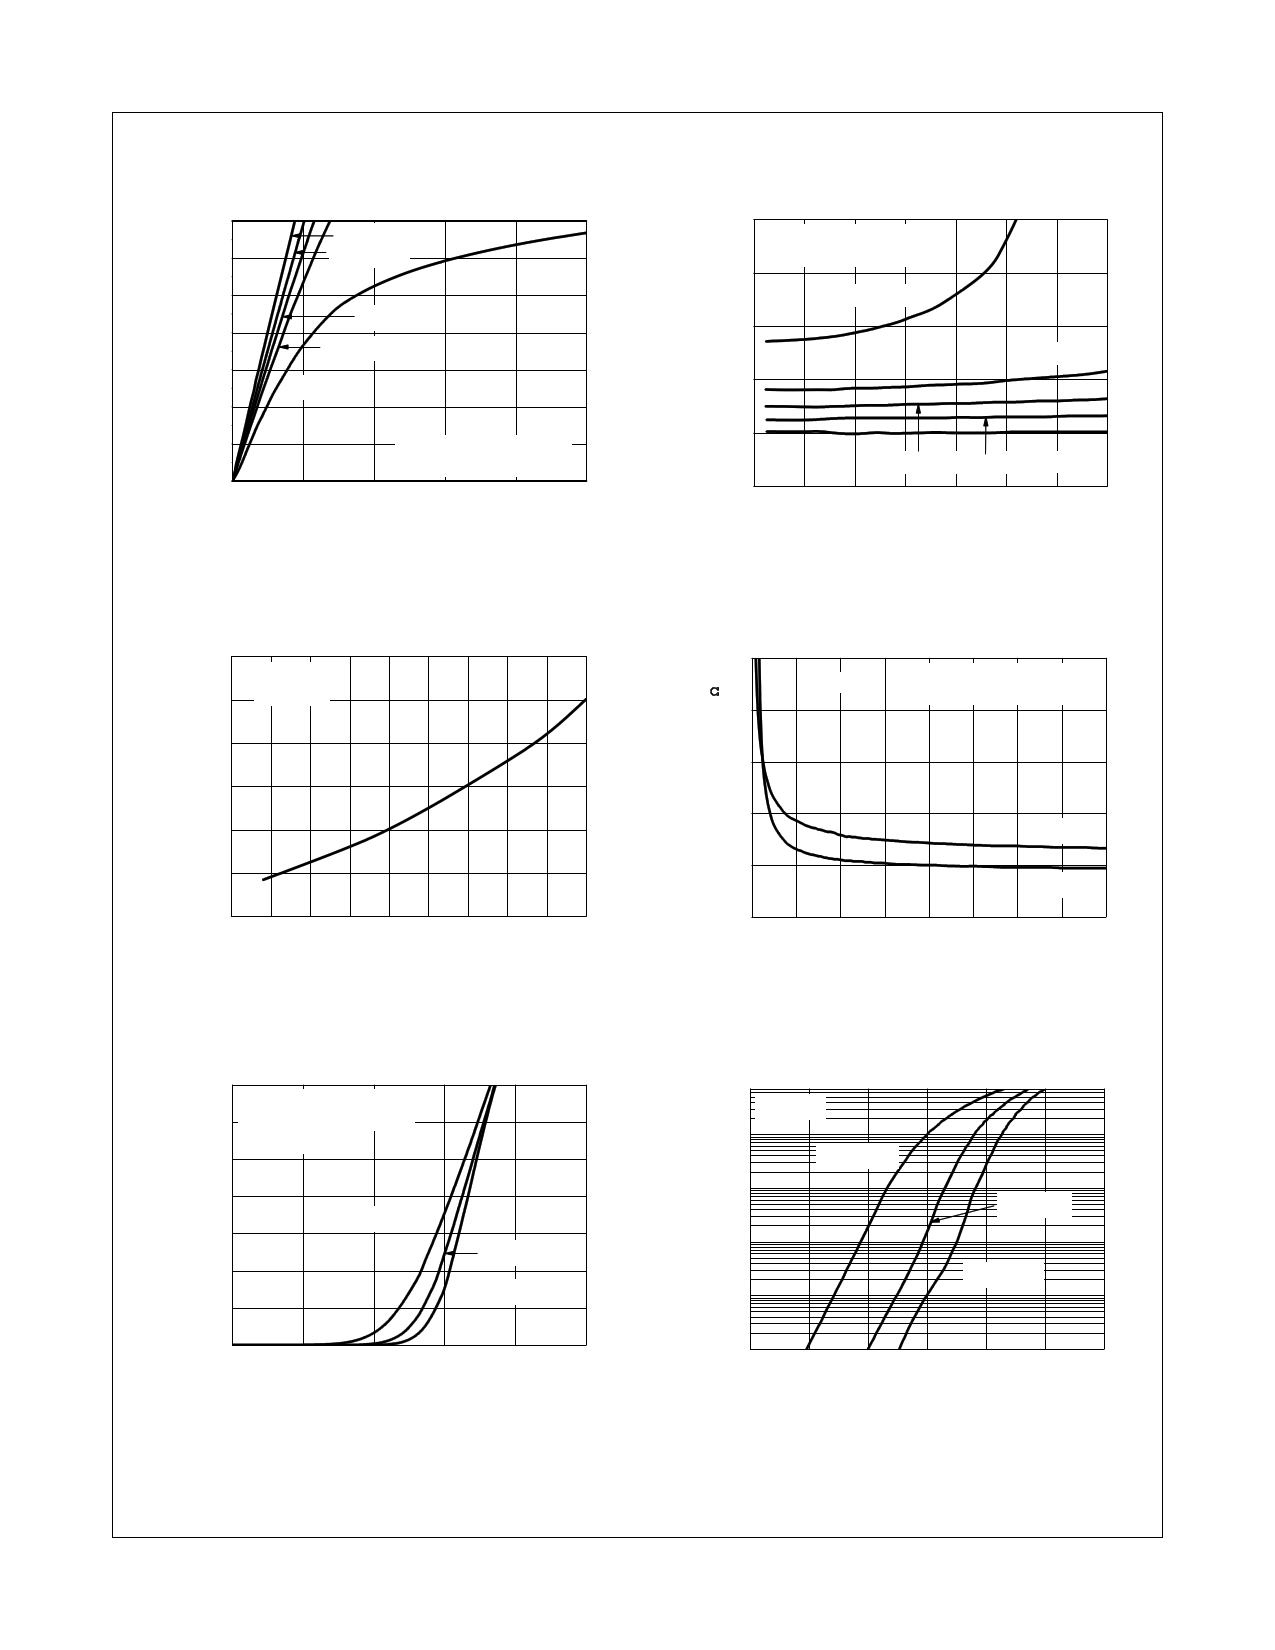 FDMS3626S pdf, 반도체, 판매, 대치품